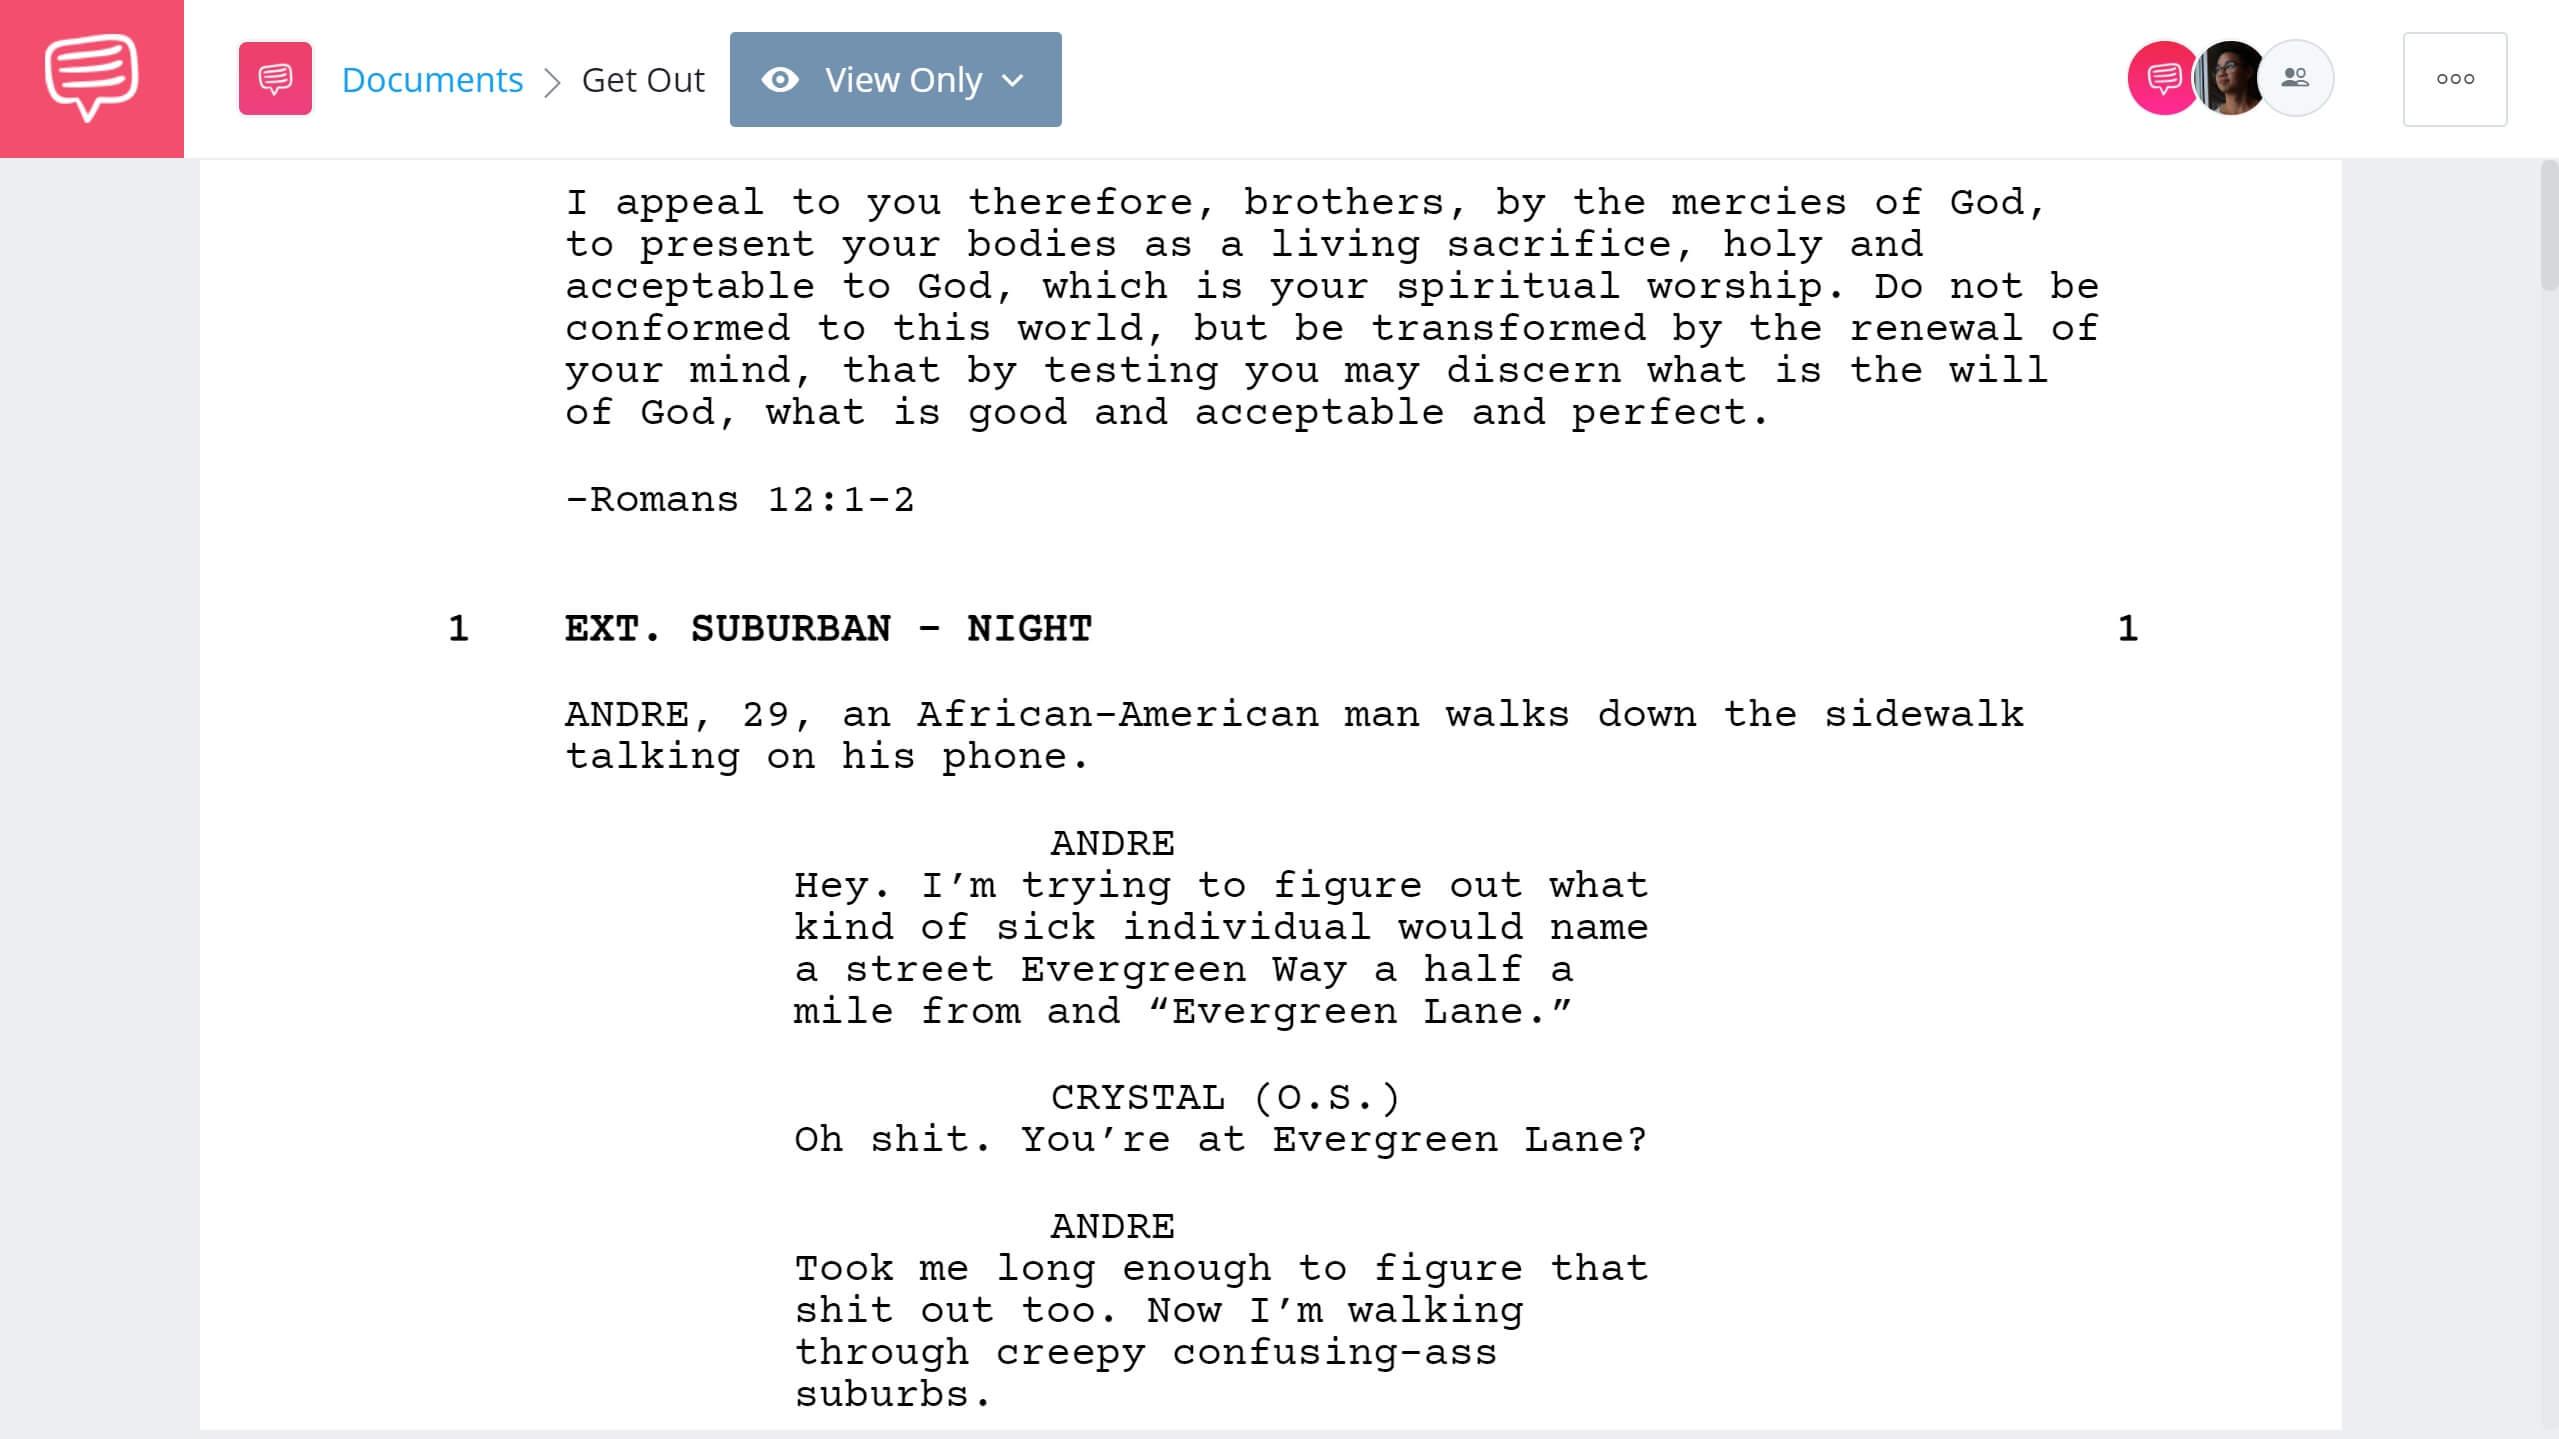 Best Original Screenplay Academy Award - Get Out Full Script PDF Download - StudioBinder Screenwriting Software